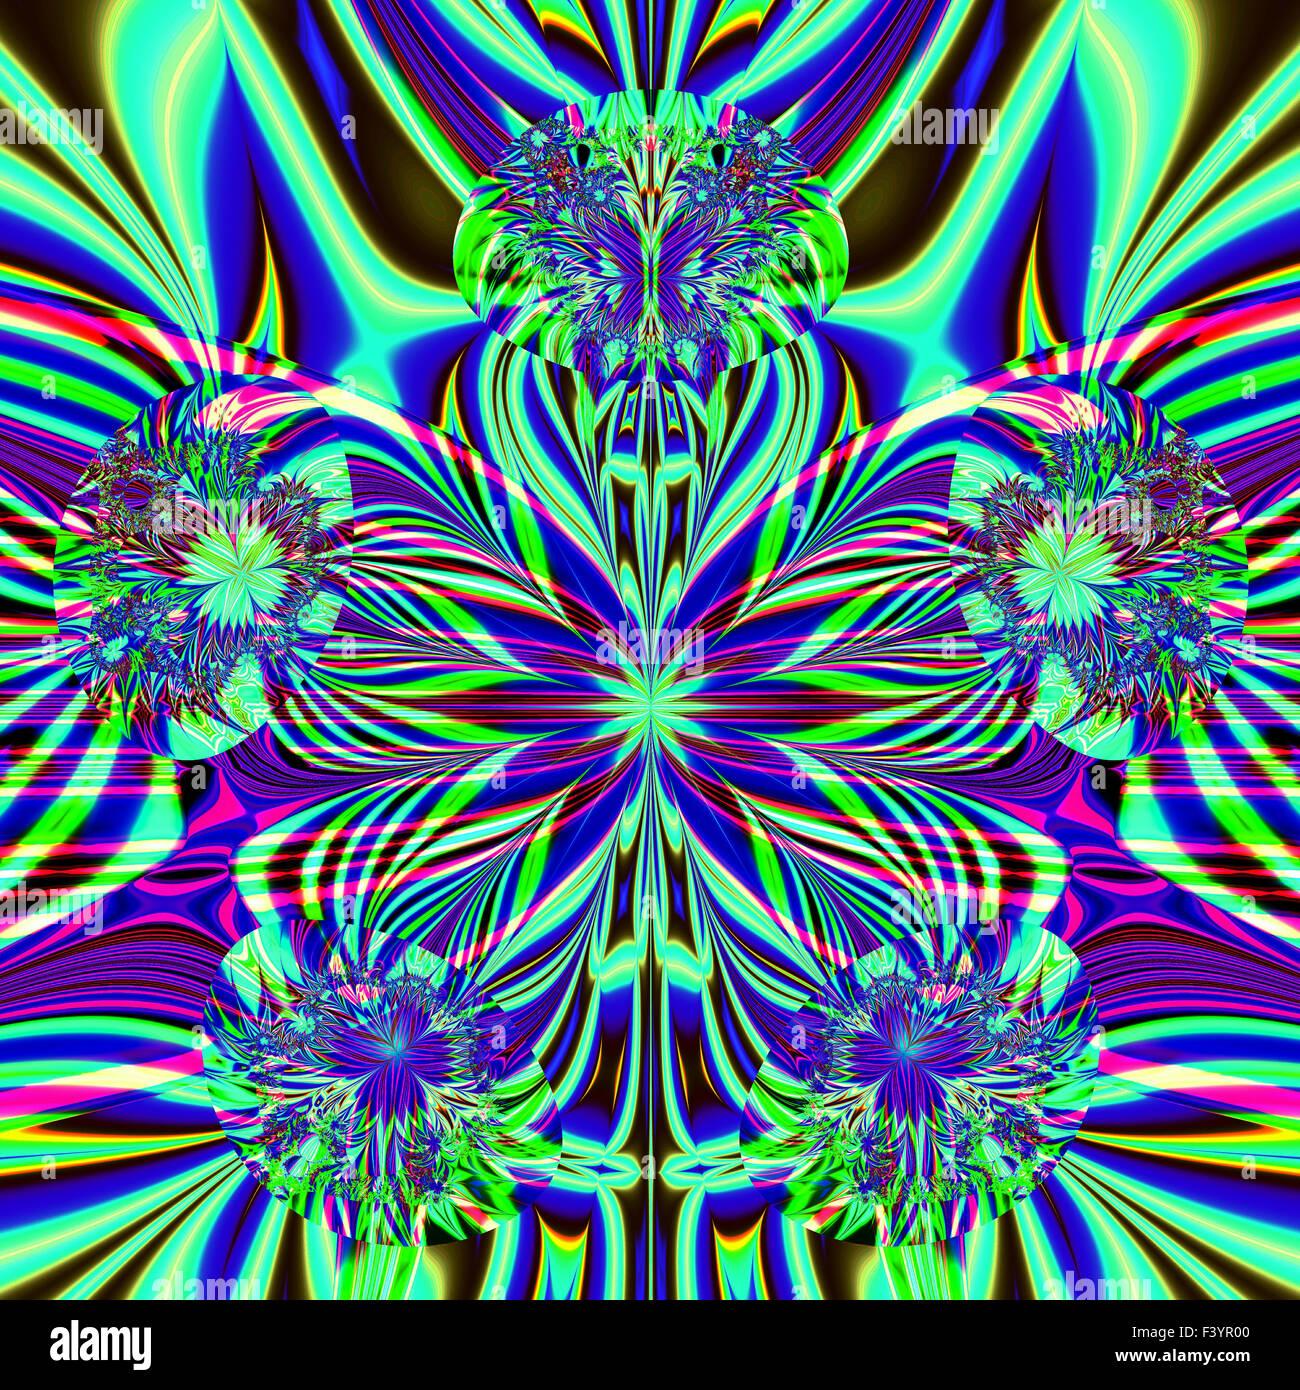 Wunderschöne bunte Fraktale bunten Ornamenten im Stil der Computergrafik. A-0279. Stockbild